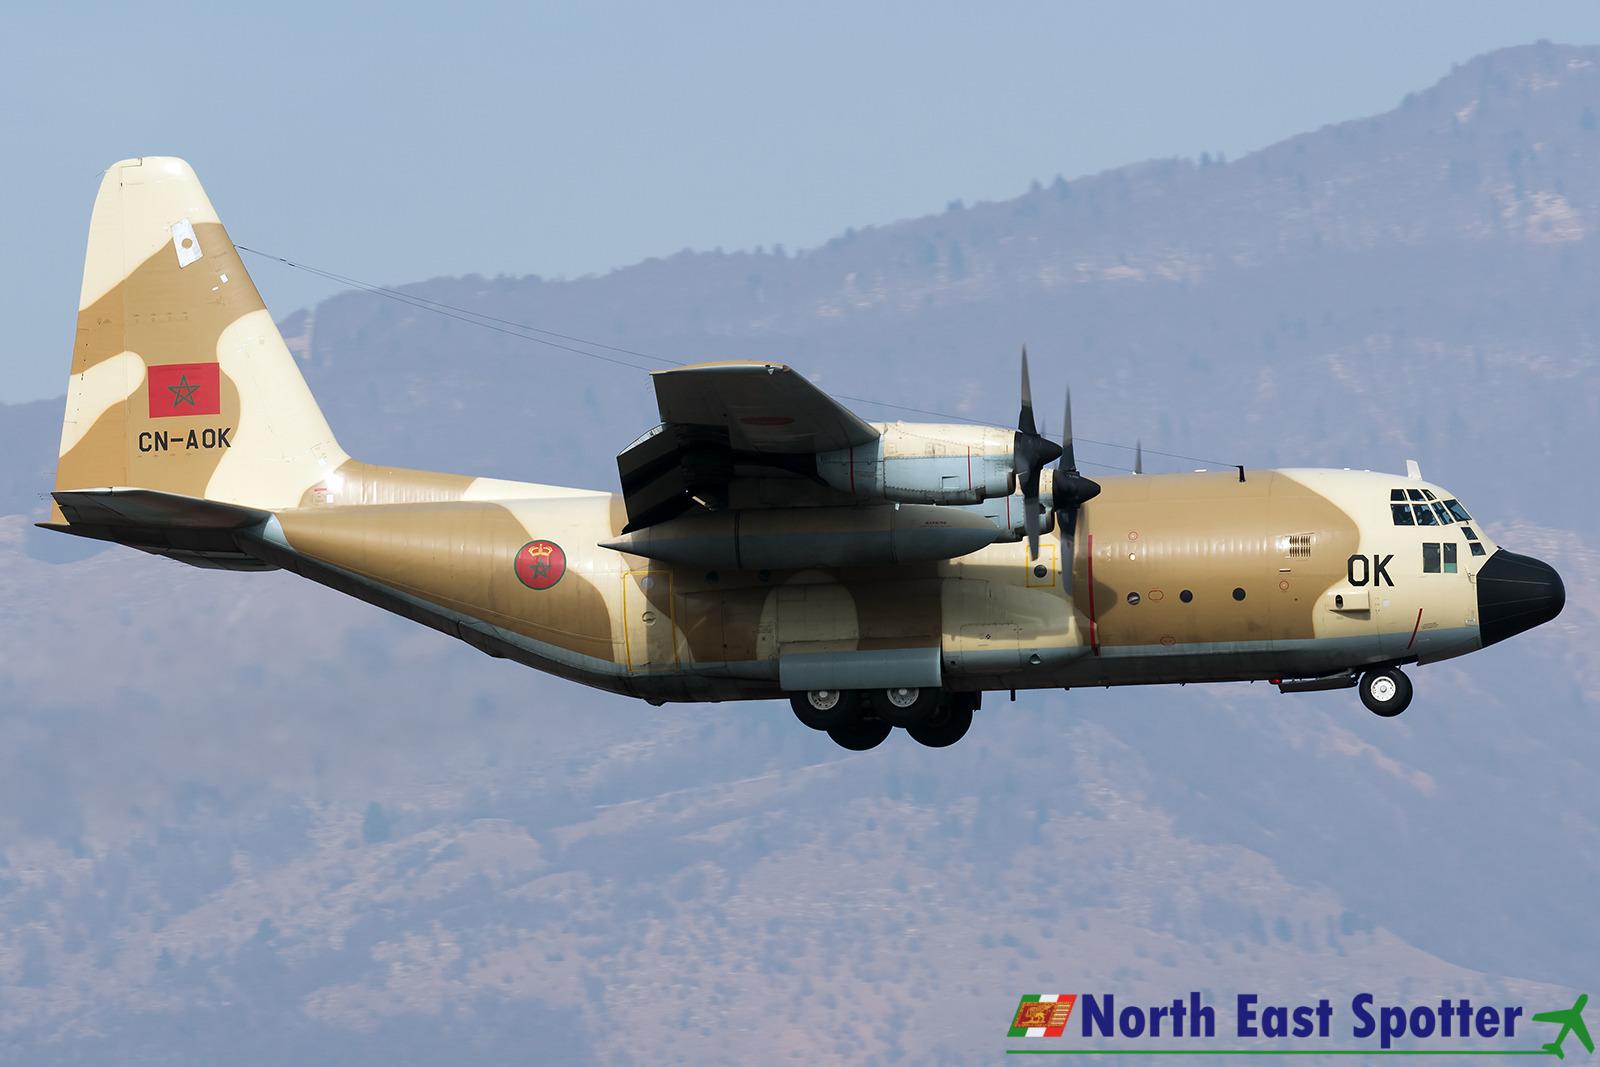 FRA: Photos d'avions de transport - Page 37 CN-AOK_AVB_16-03-19